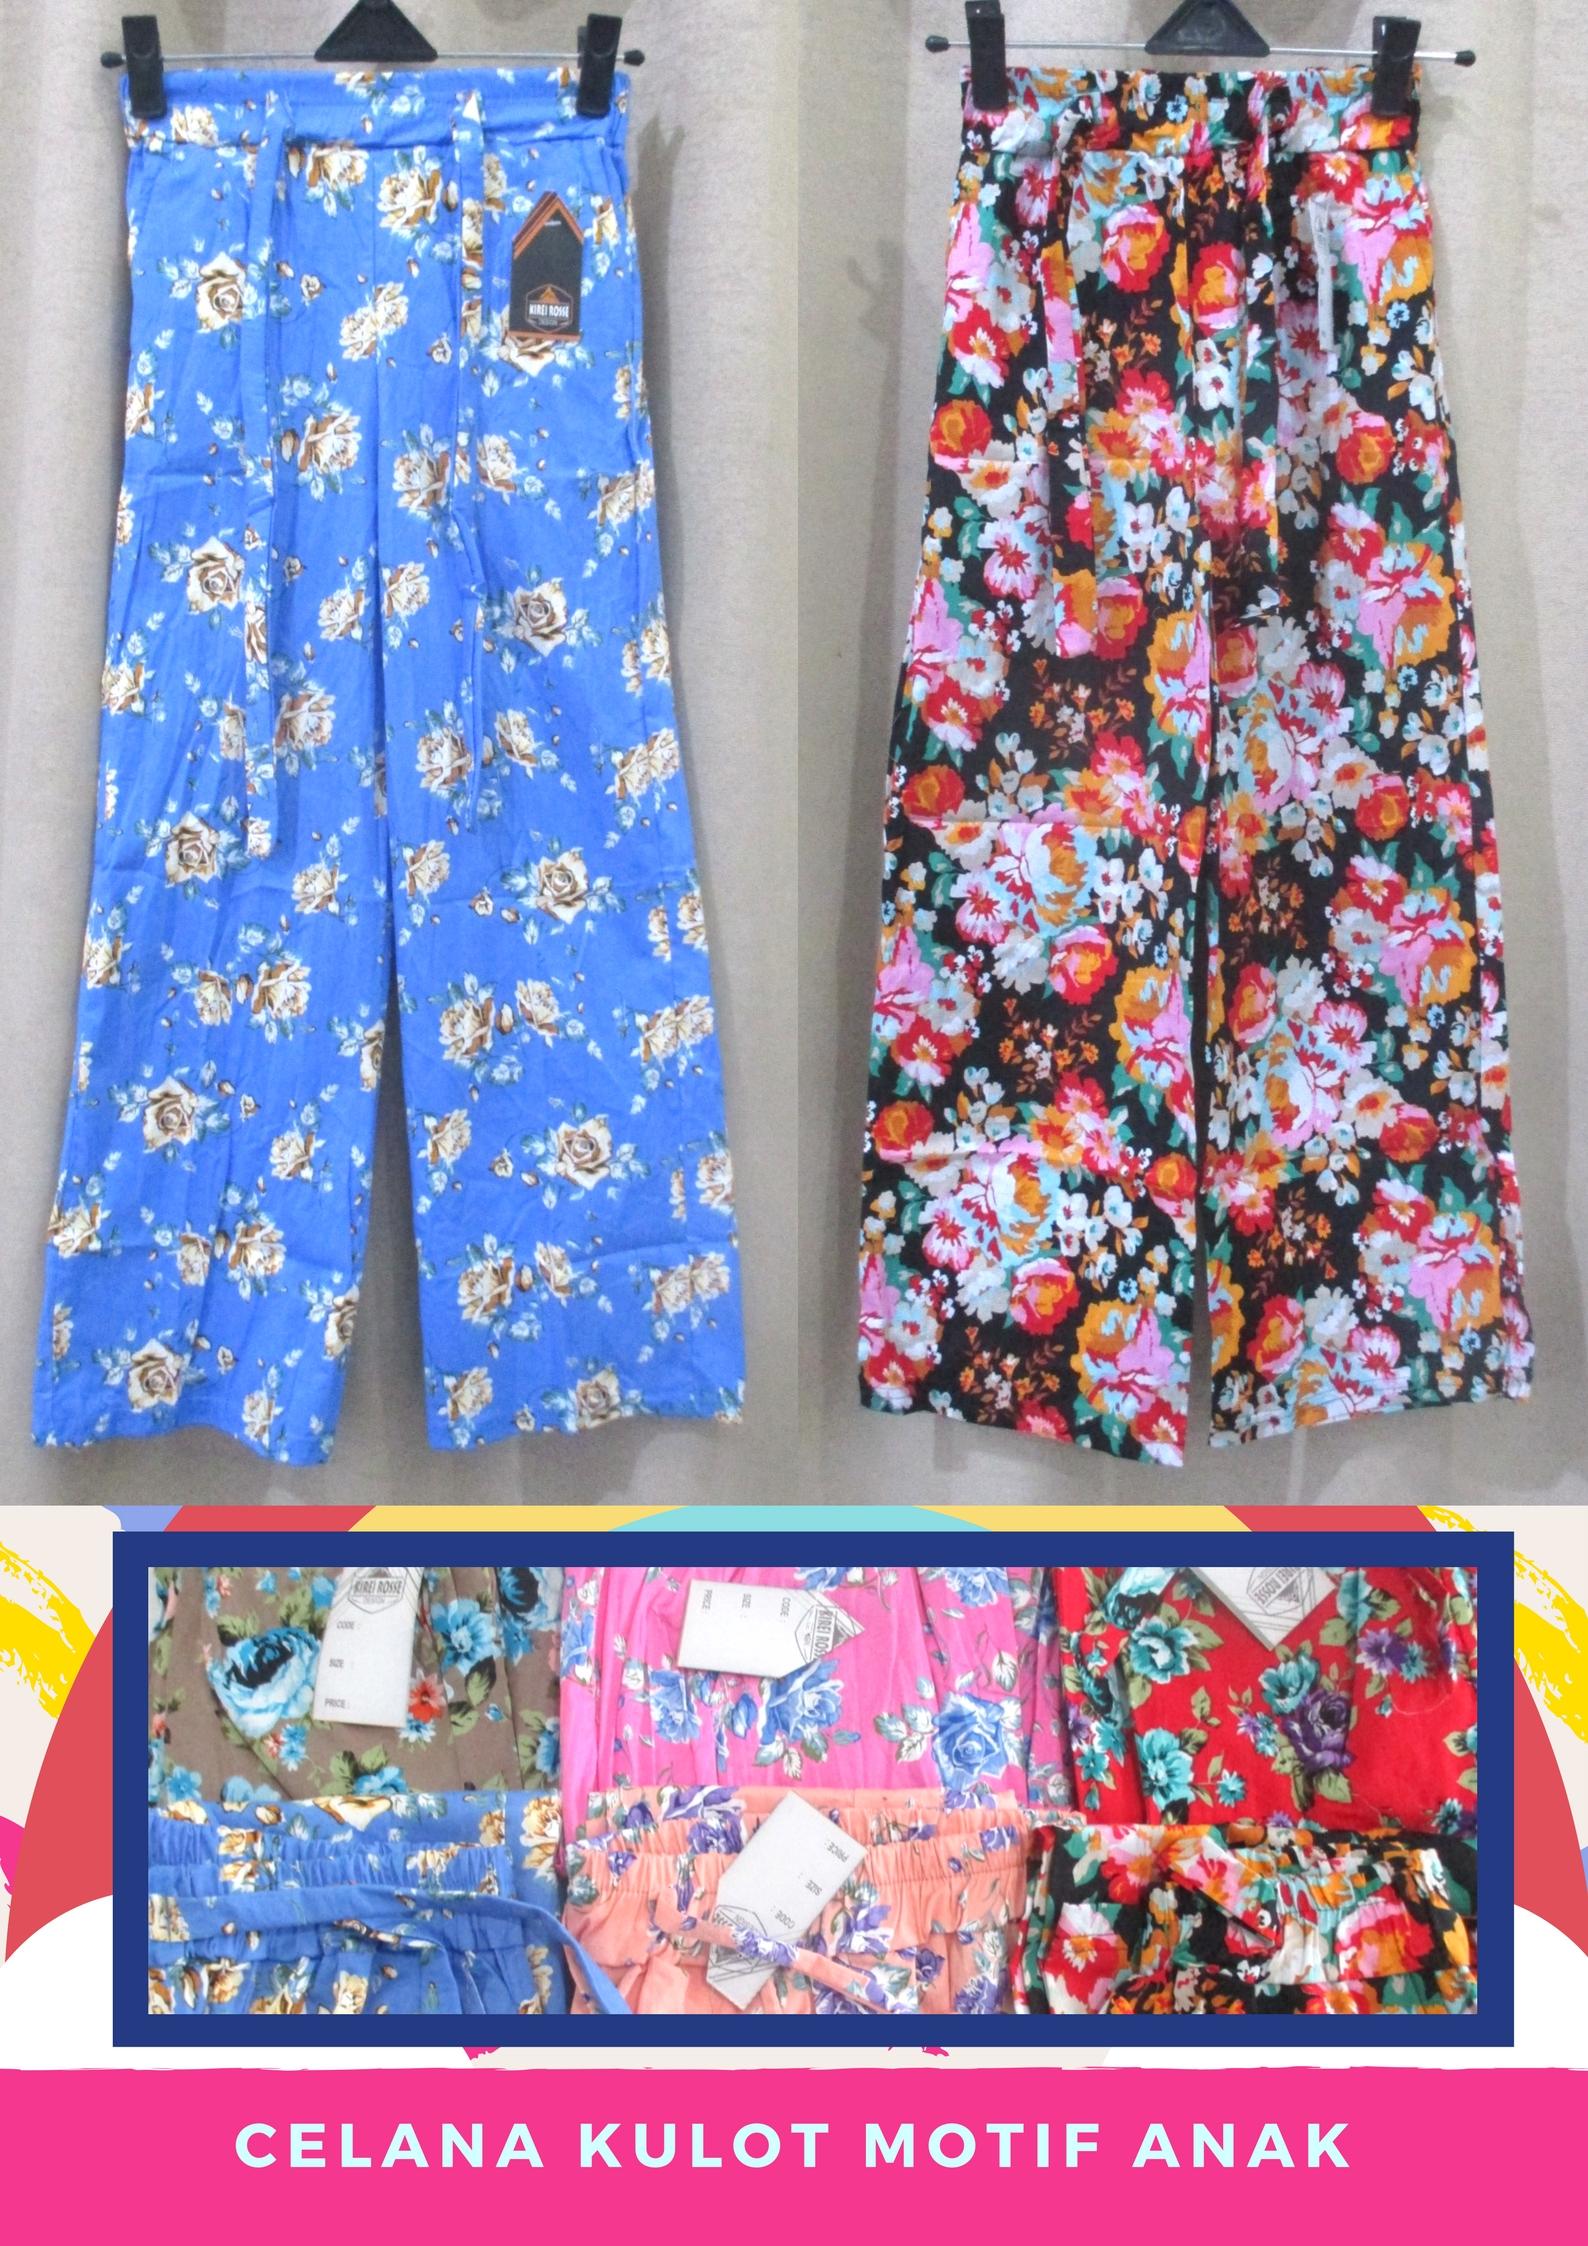 Pusat Grosir Baju Murah Solo Klewer 2019 Agen Celana Kulot Motif Anak Perempuan Murah di Solo 24Ribu